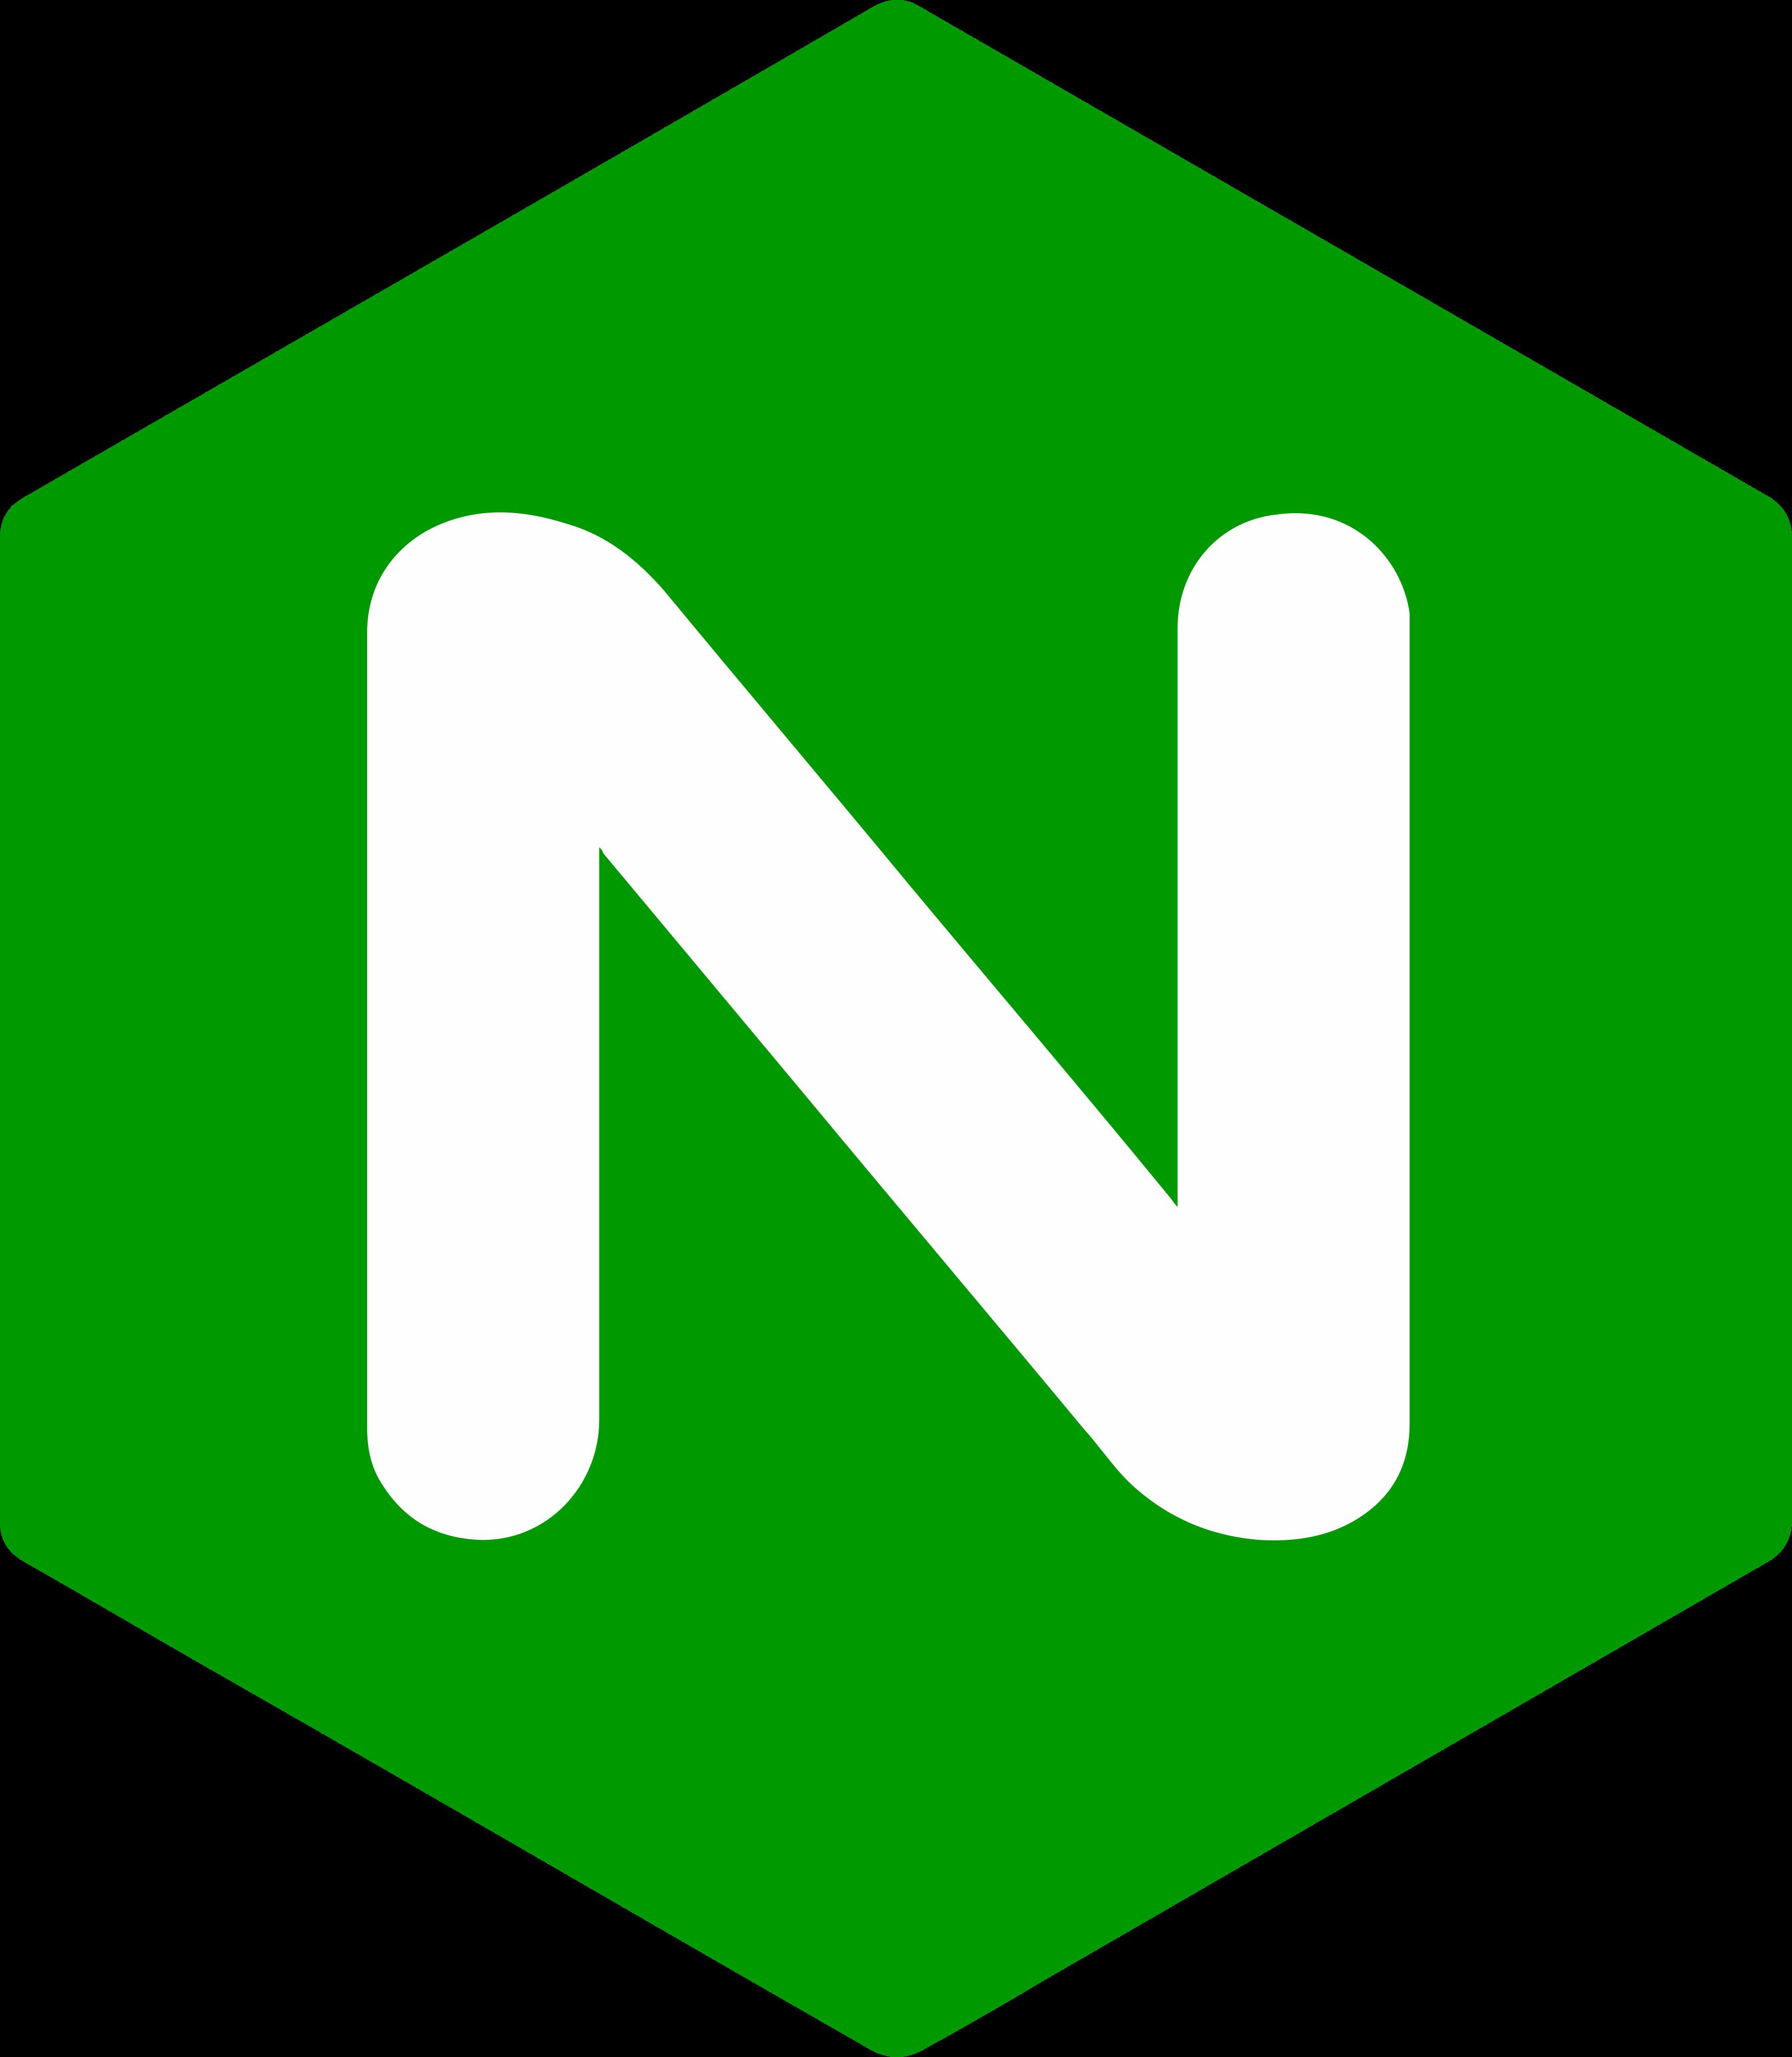 nginx-logo-1